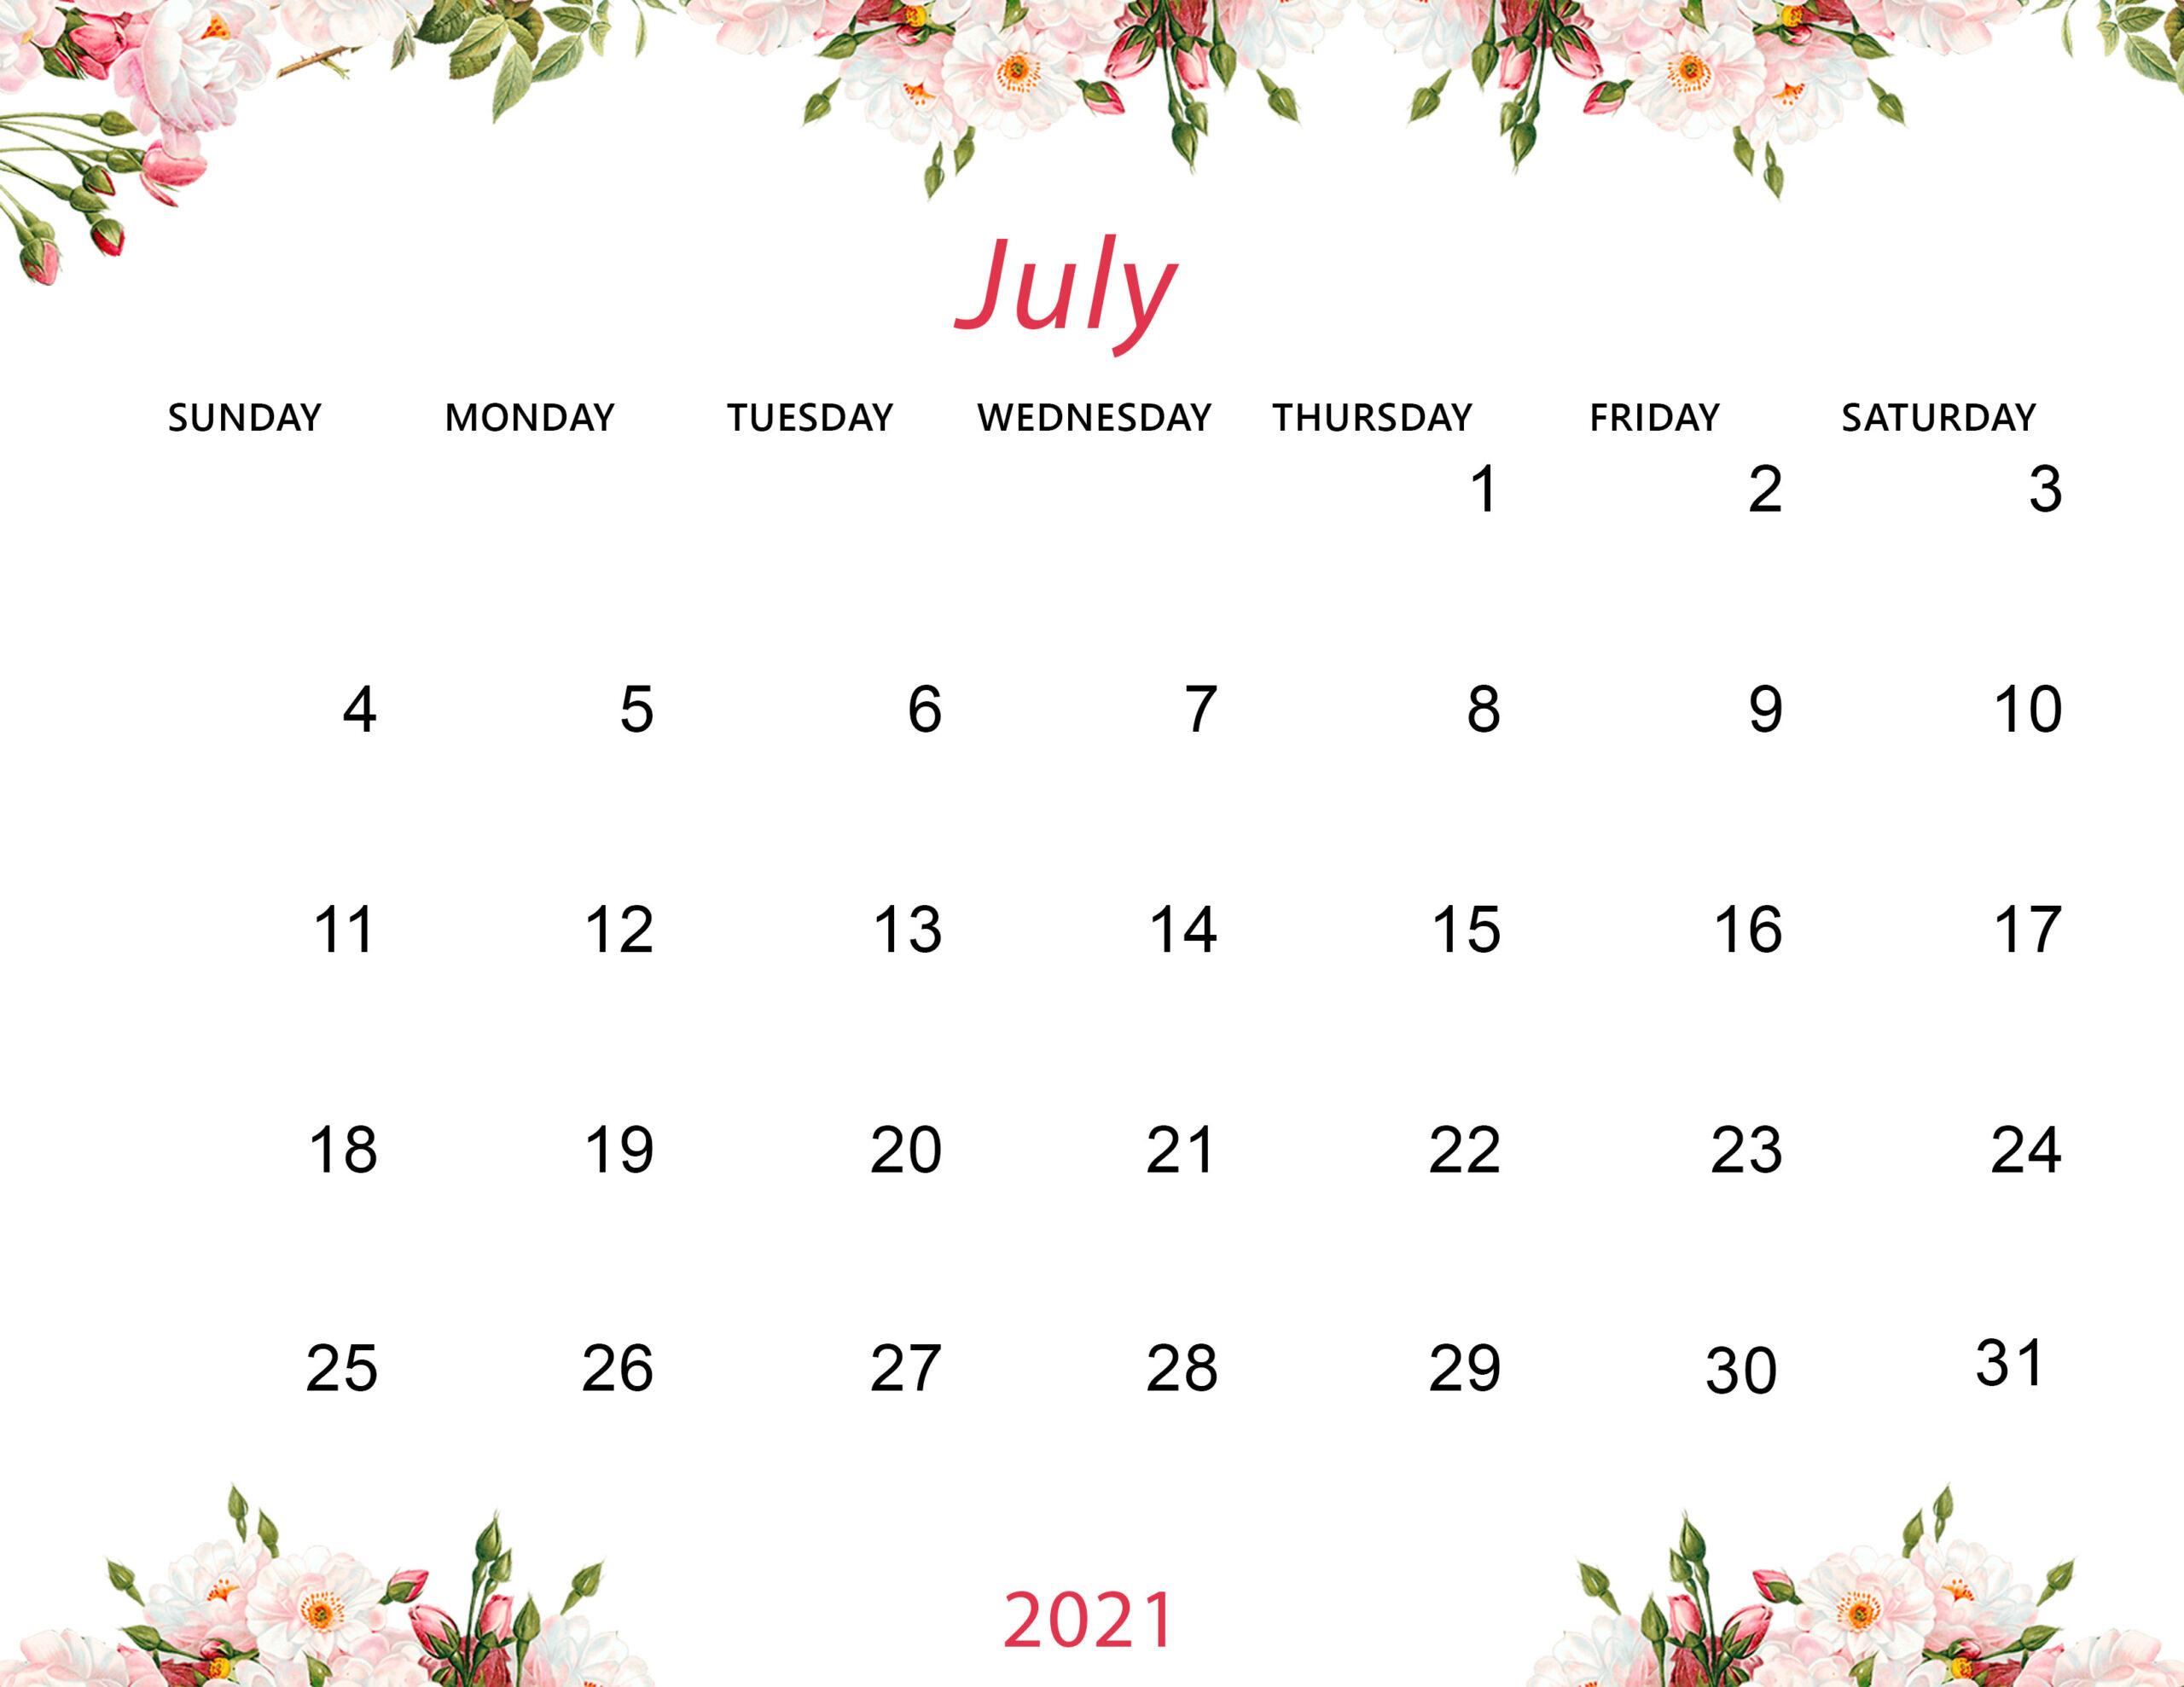 Desktop Calendar Wallpaper For July 2021